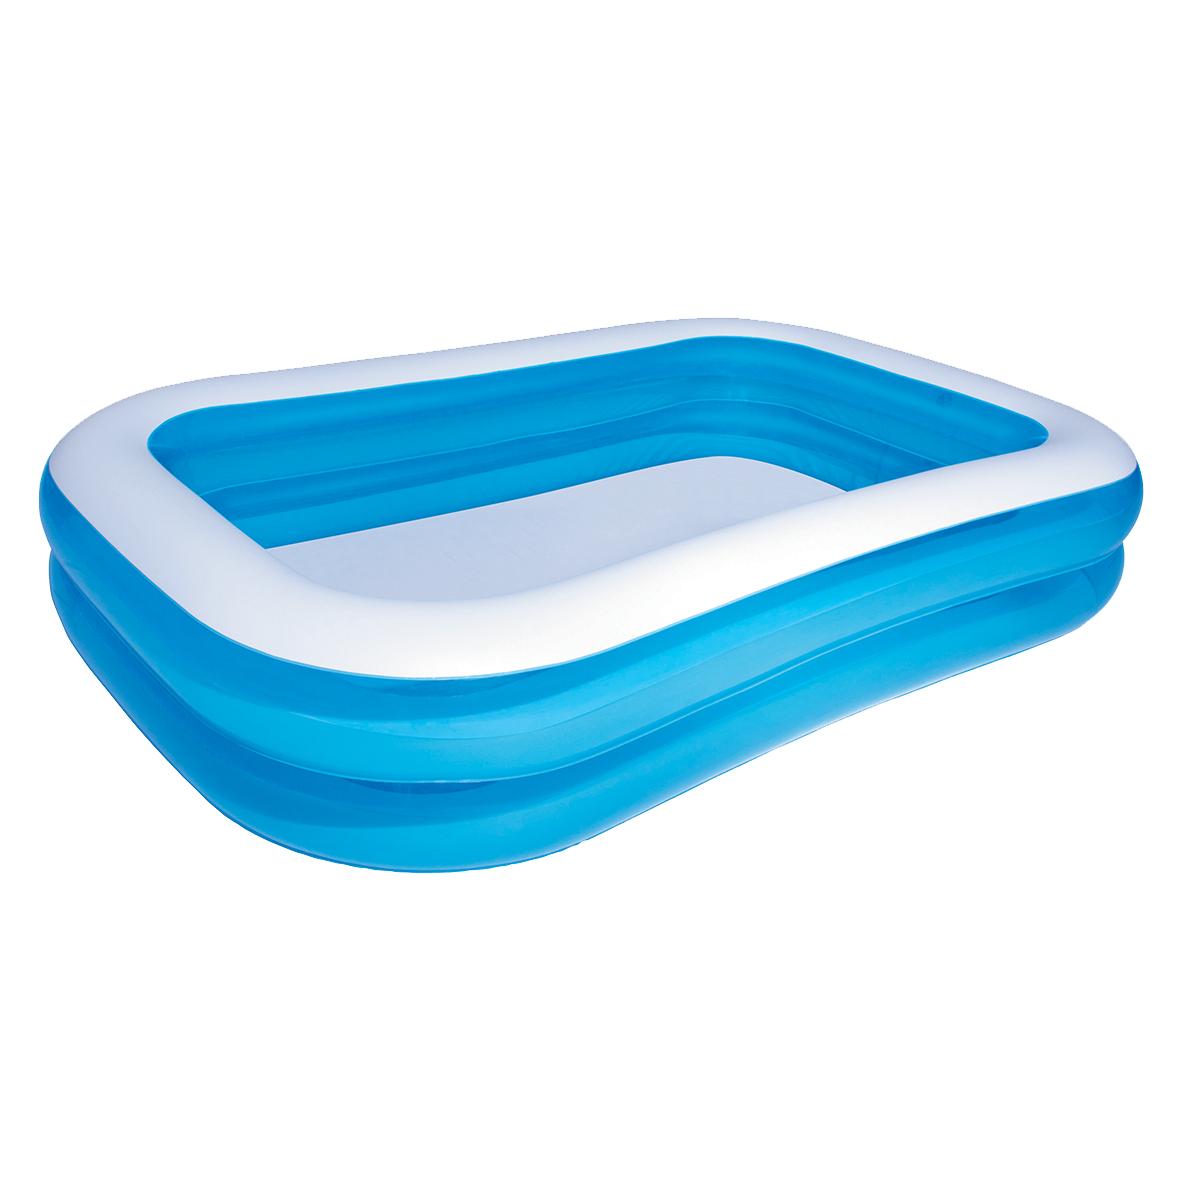 bestway-269-x-175-x-51cm-blue-rectangular-family-pool--code-54006